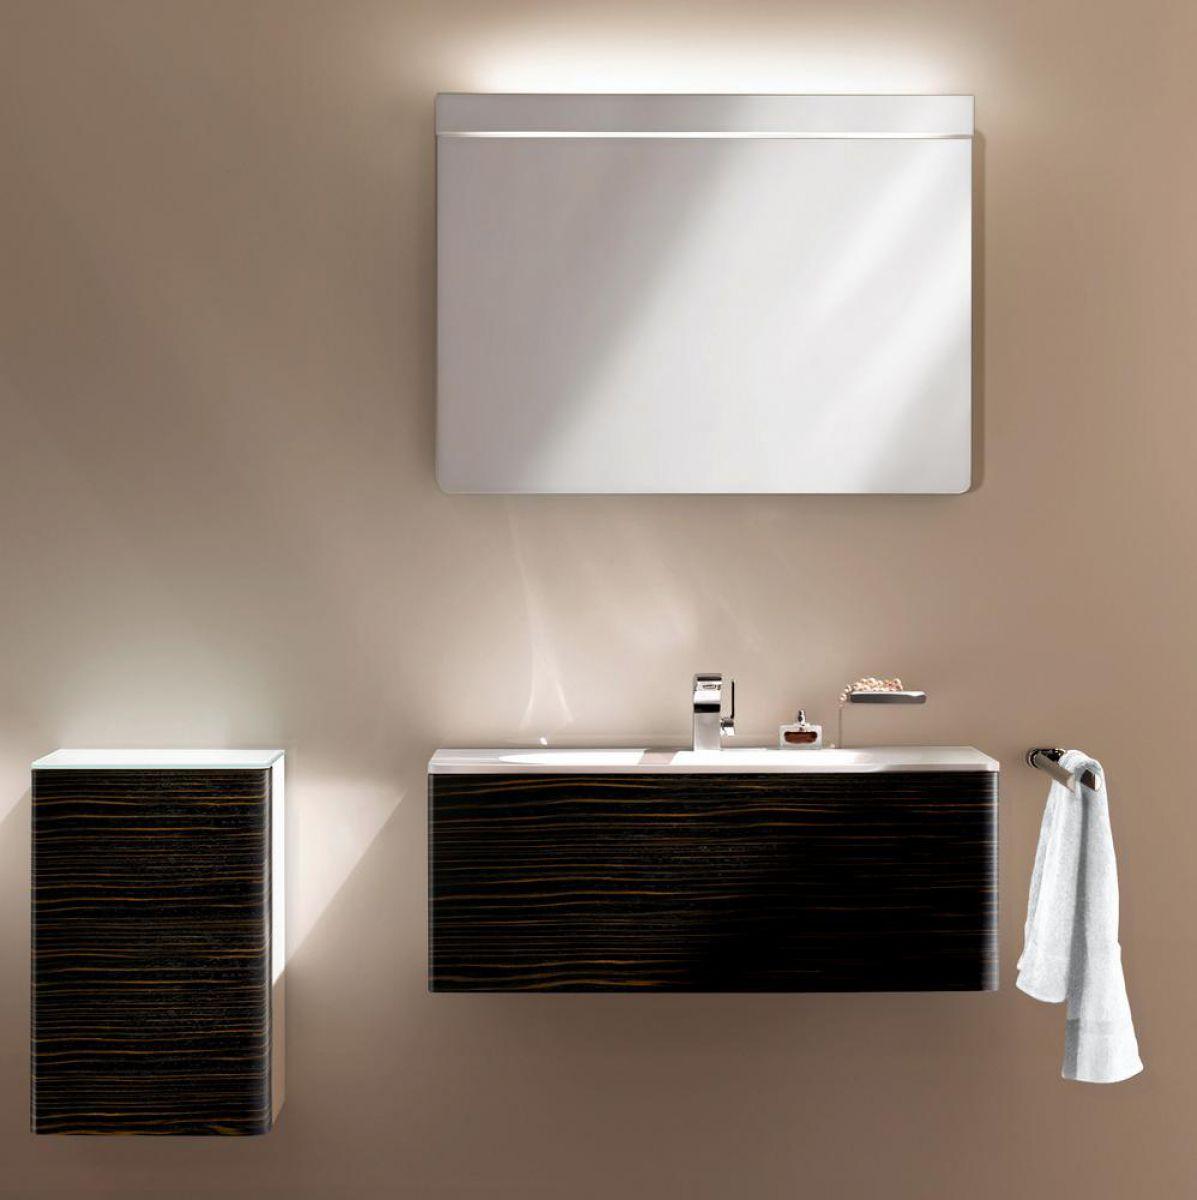 keuco elegance light mirror uk bathrooms. Black Bedroom Furniture Sets. Home Design Ideas